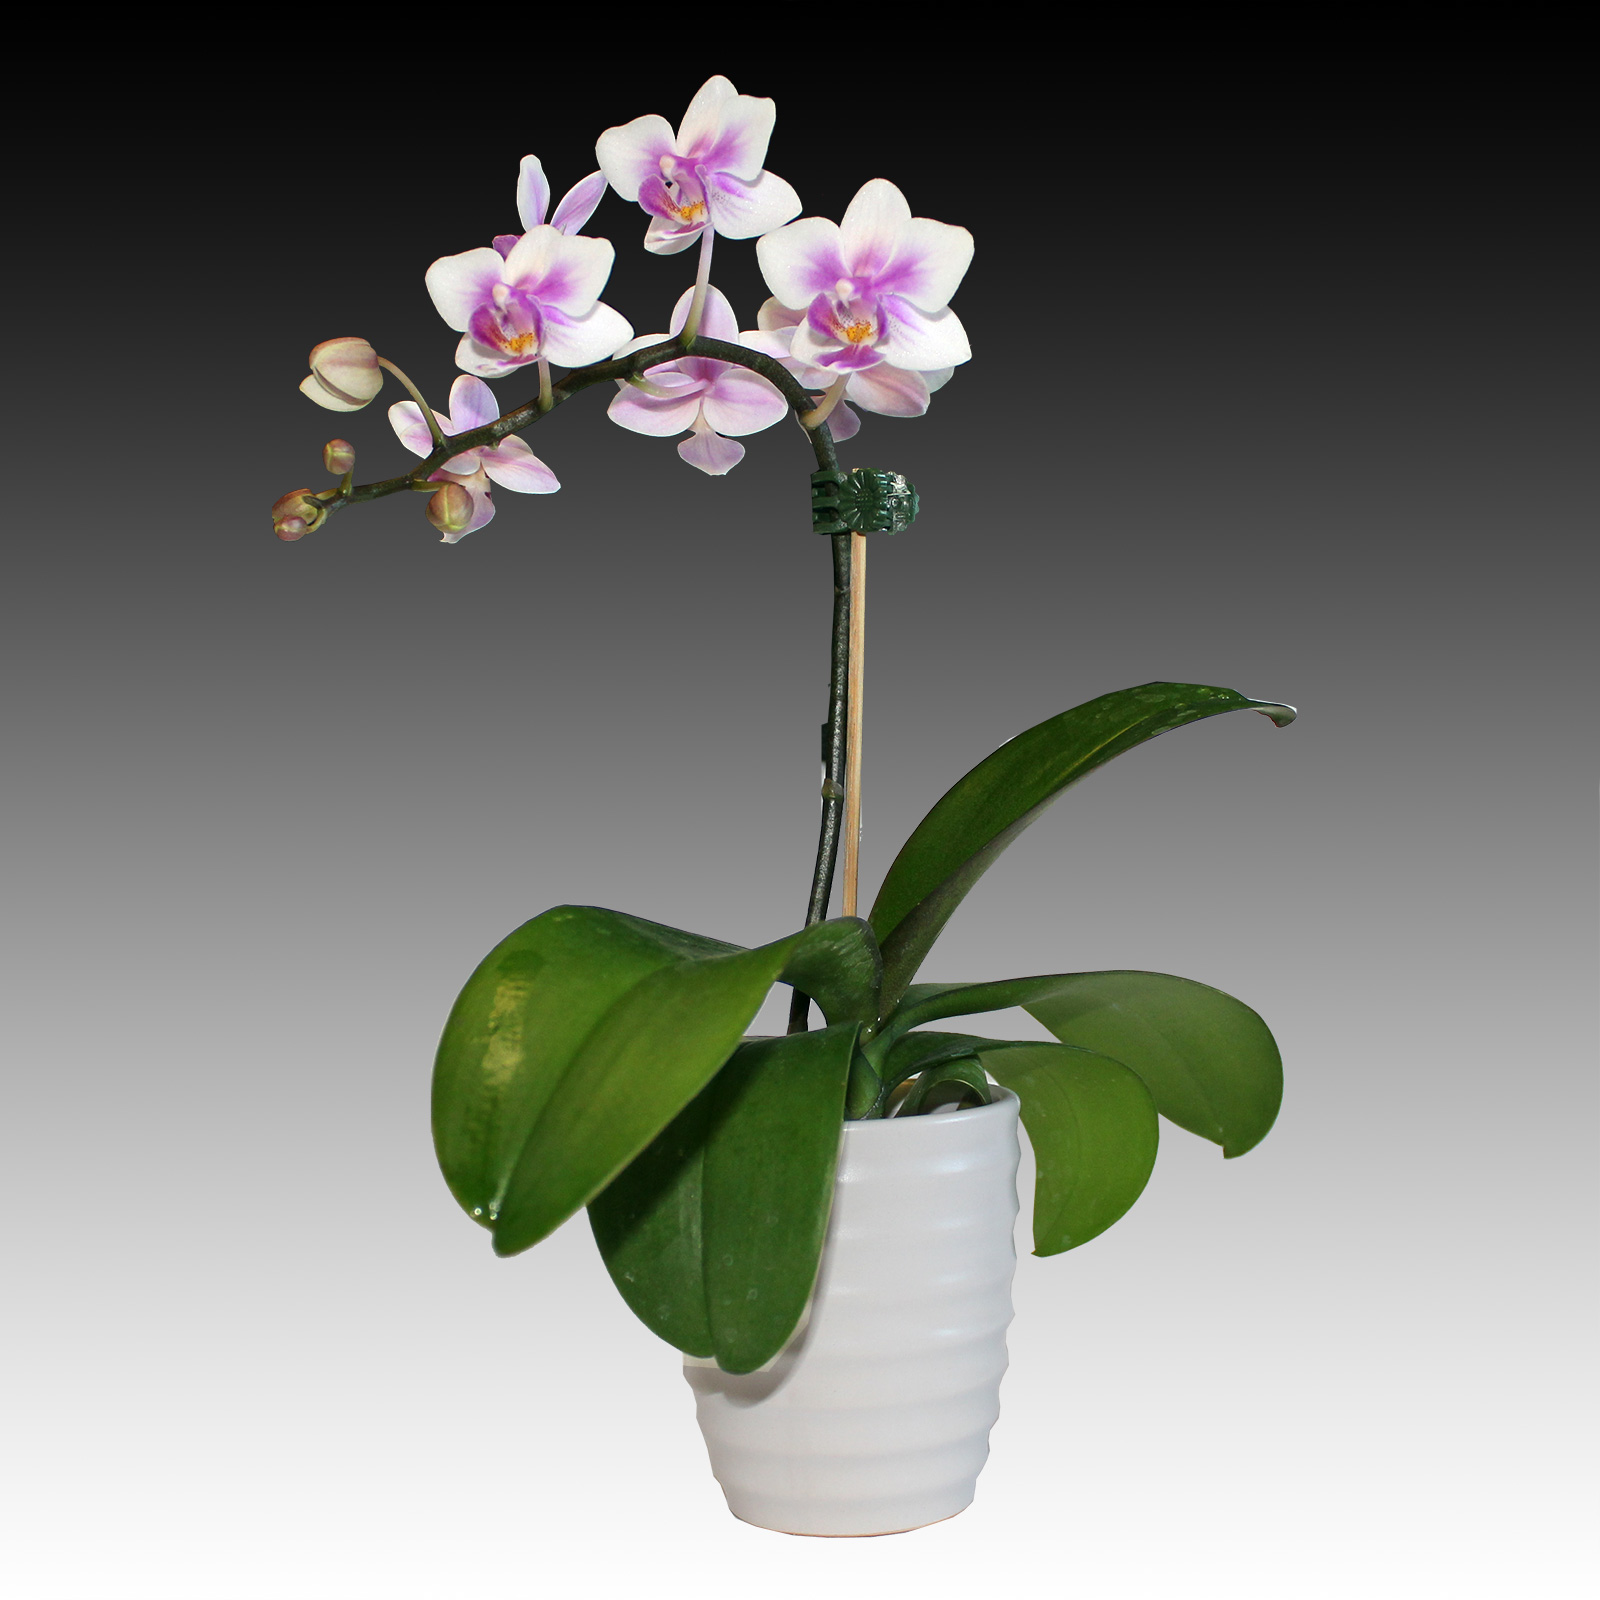 Indoor Zen Small Phalaenopsis White Pink Orchid Flower White Vase